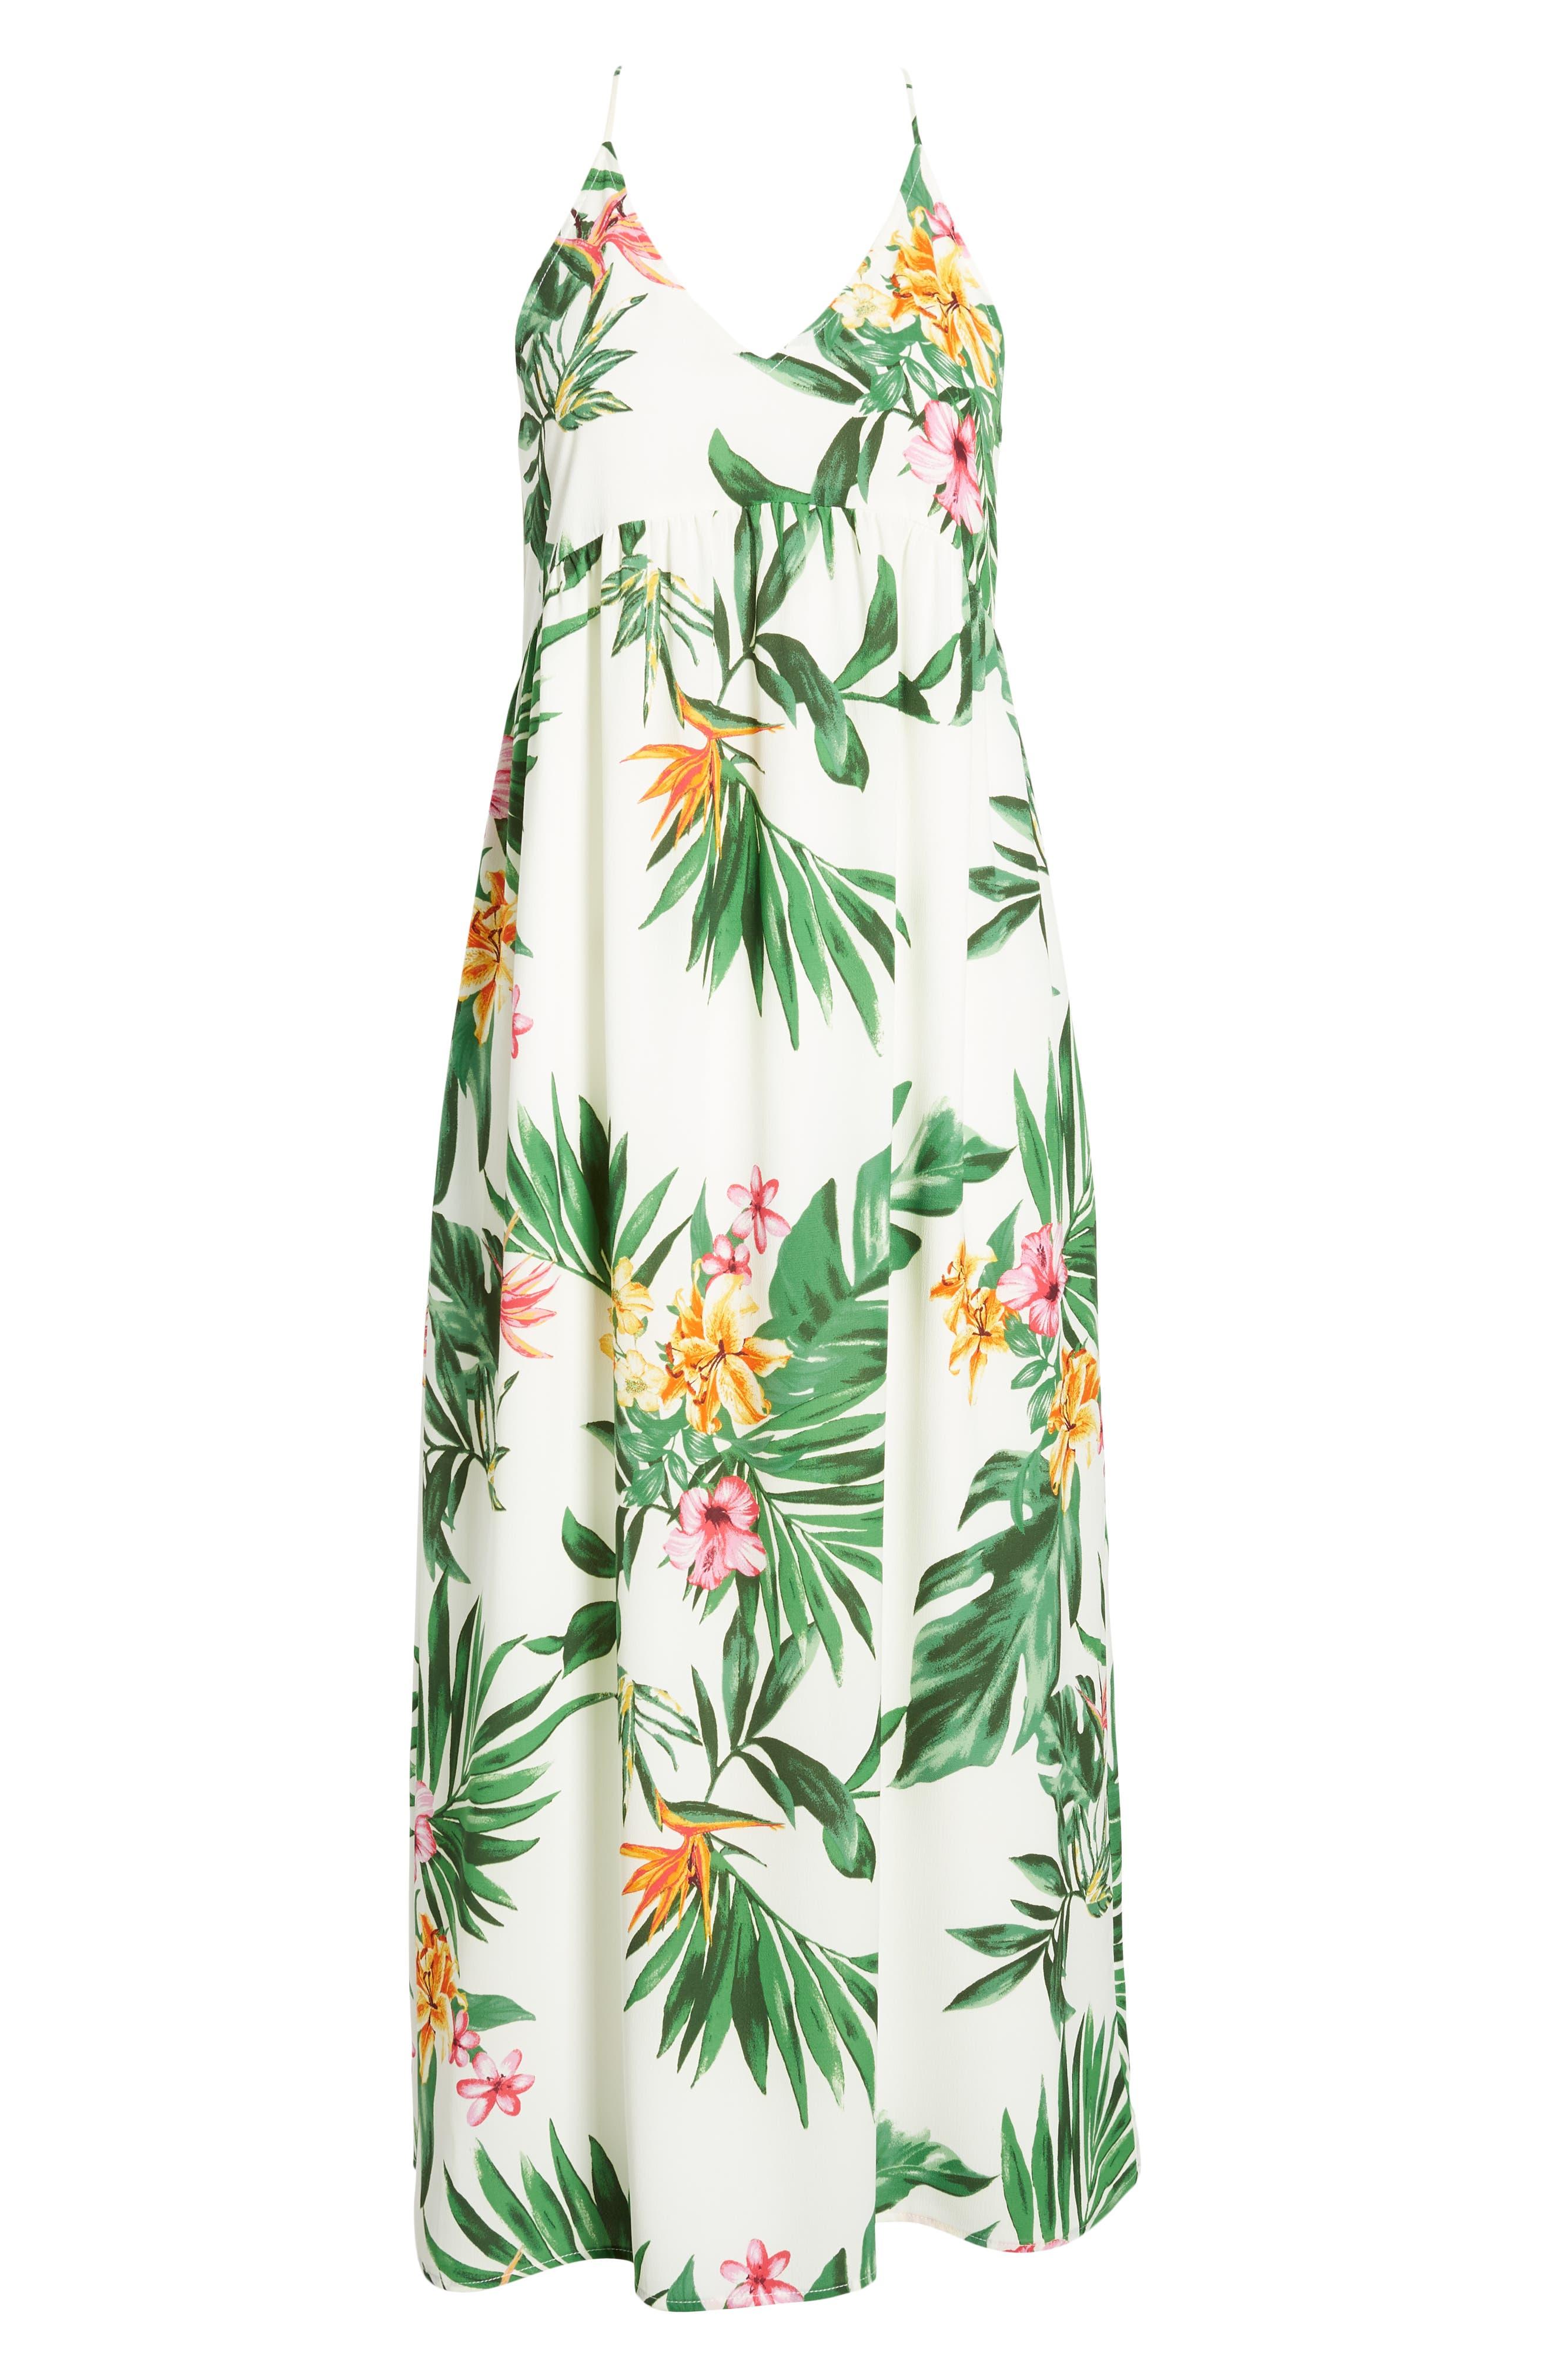 GIBSON, x Hi Sugarplum! Palm Springs Festival Maxi Dress, Alternate thumbnail 6, color, BIRD OF PARADISE